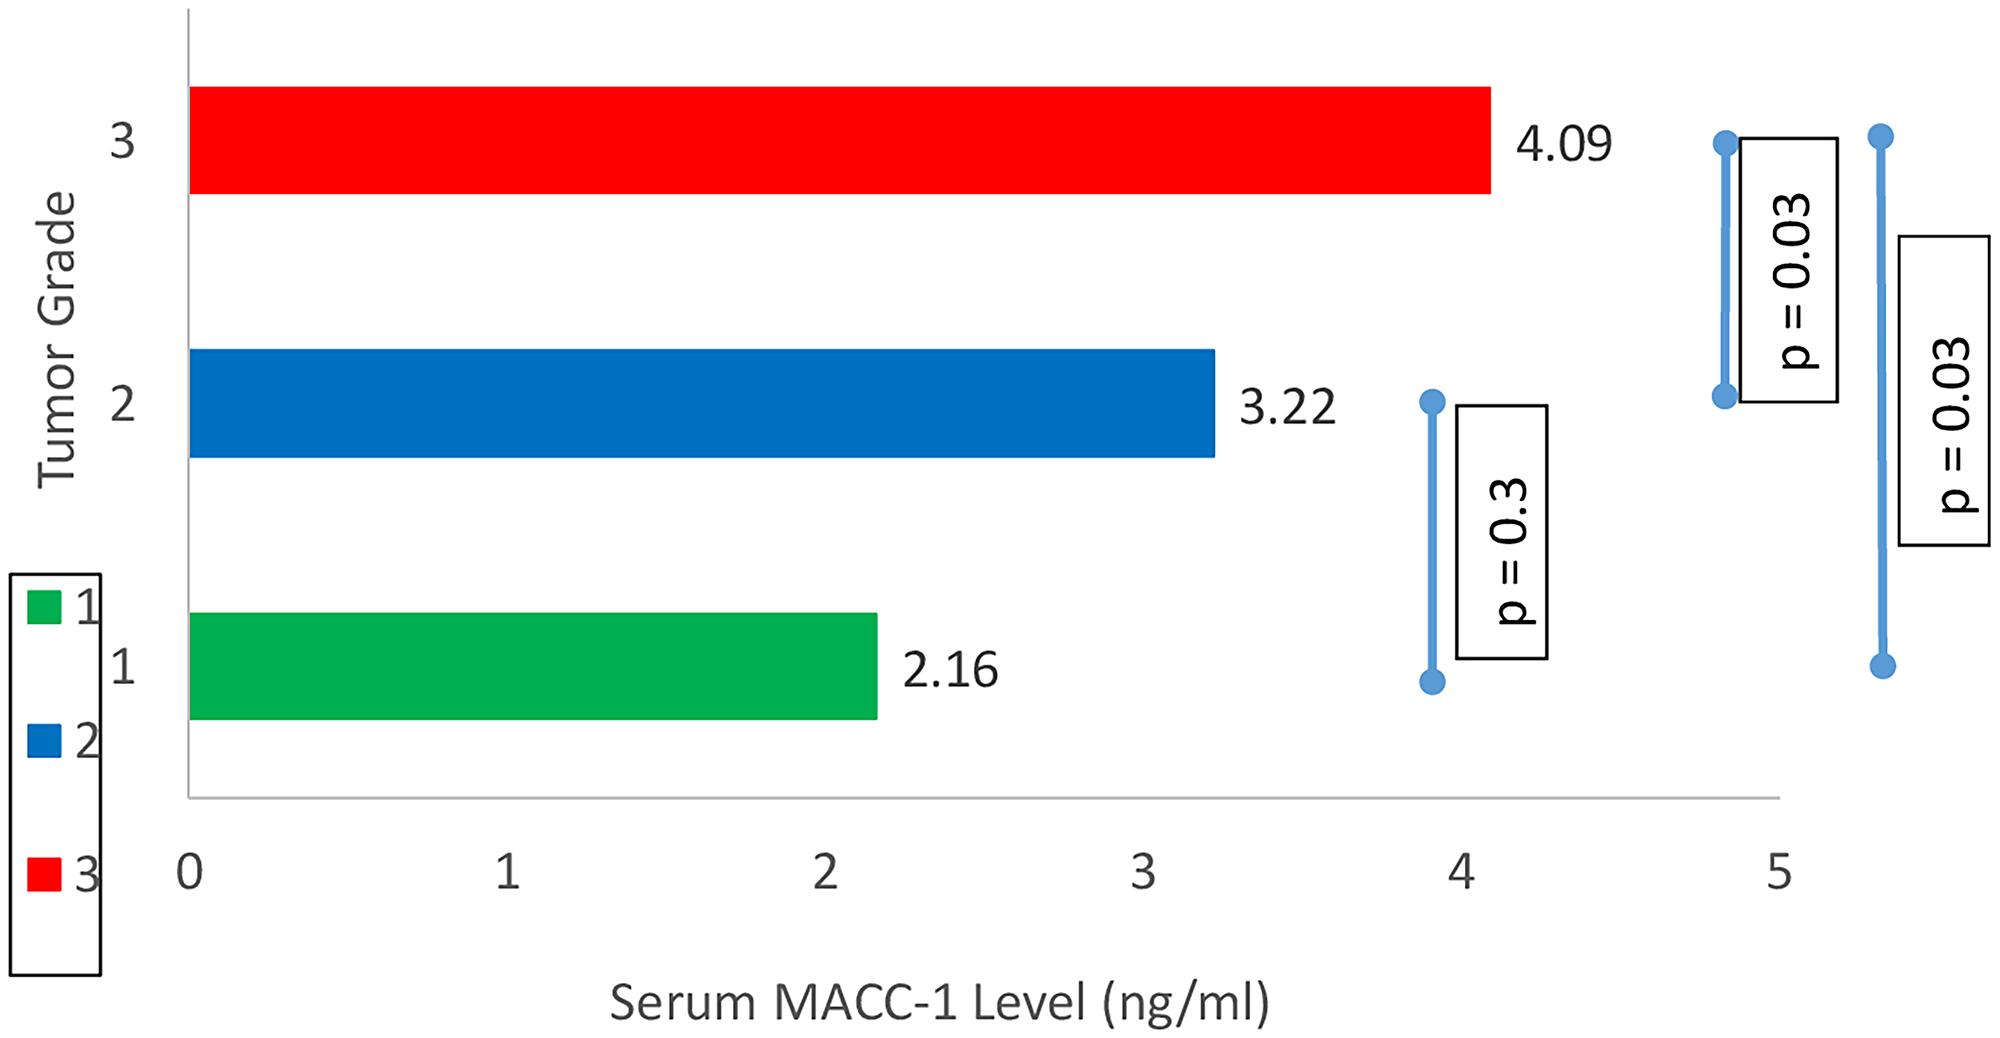 Correlation between tumor grade and serum MACC-1.